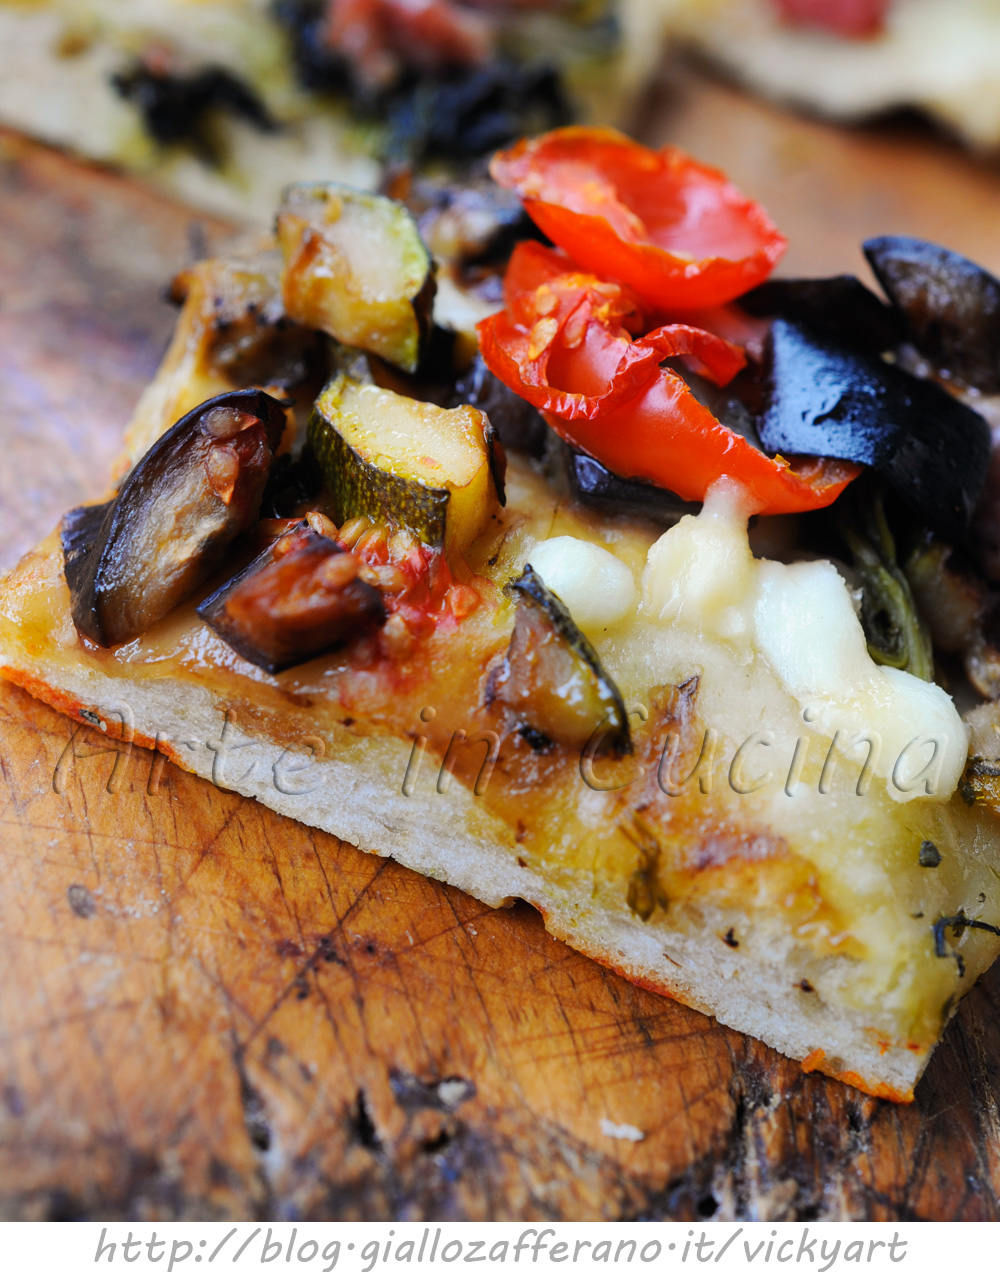 Pizza ortolana a lievitazione lenta bassa e soffice vickyart arte in cucina